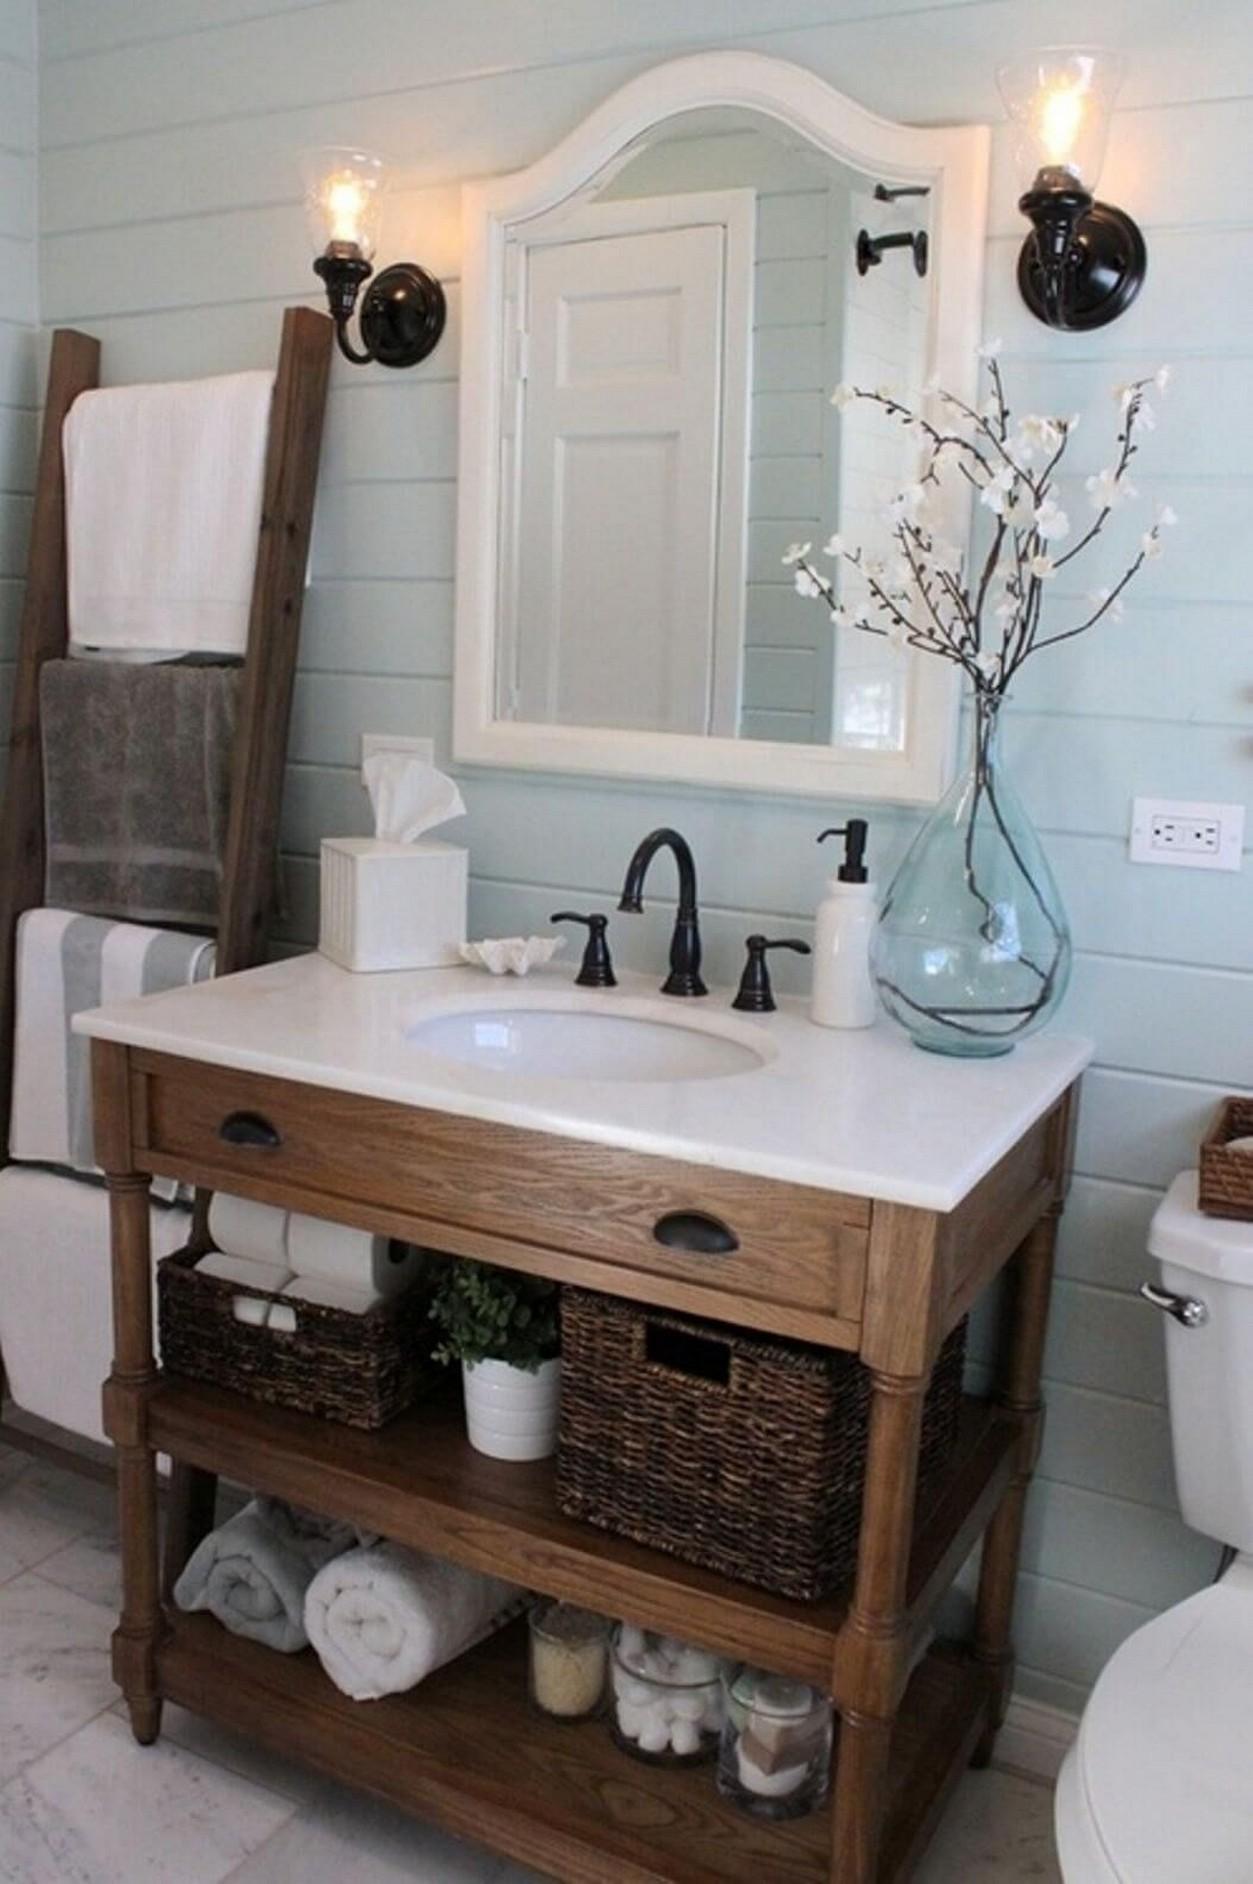 83 Modern Bathroom Design Some Tips Home Decor 26